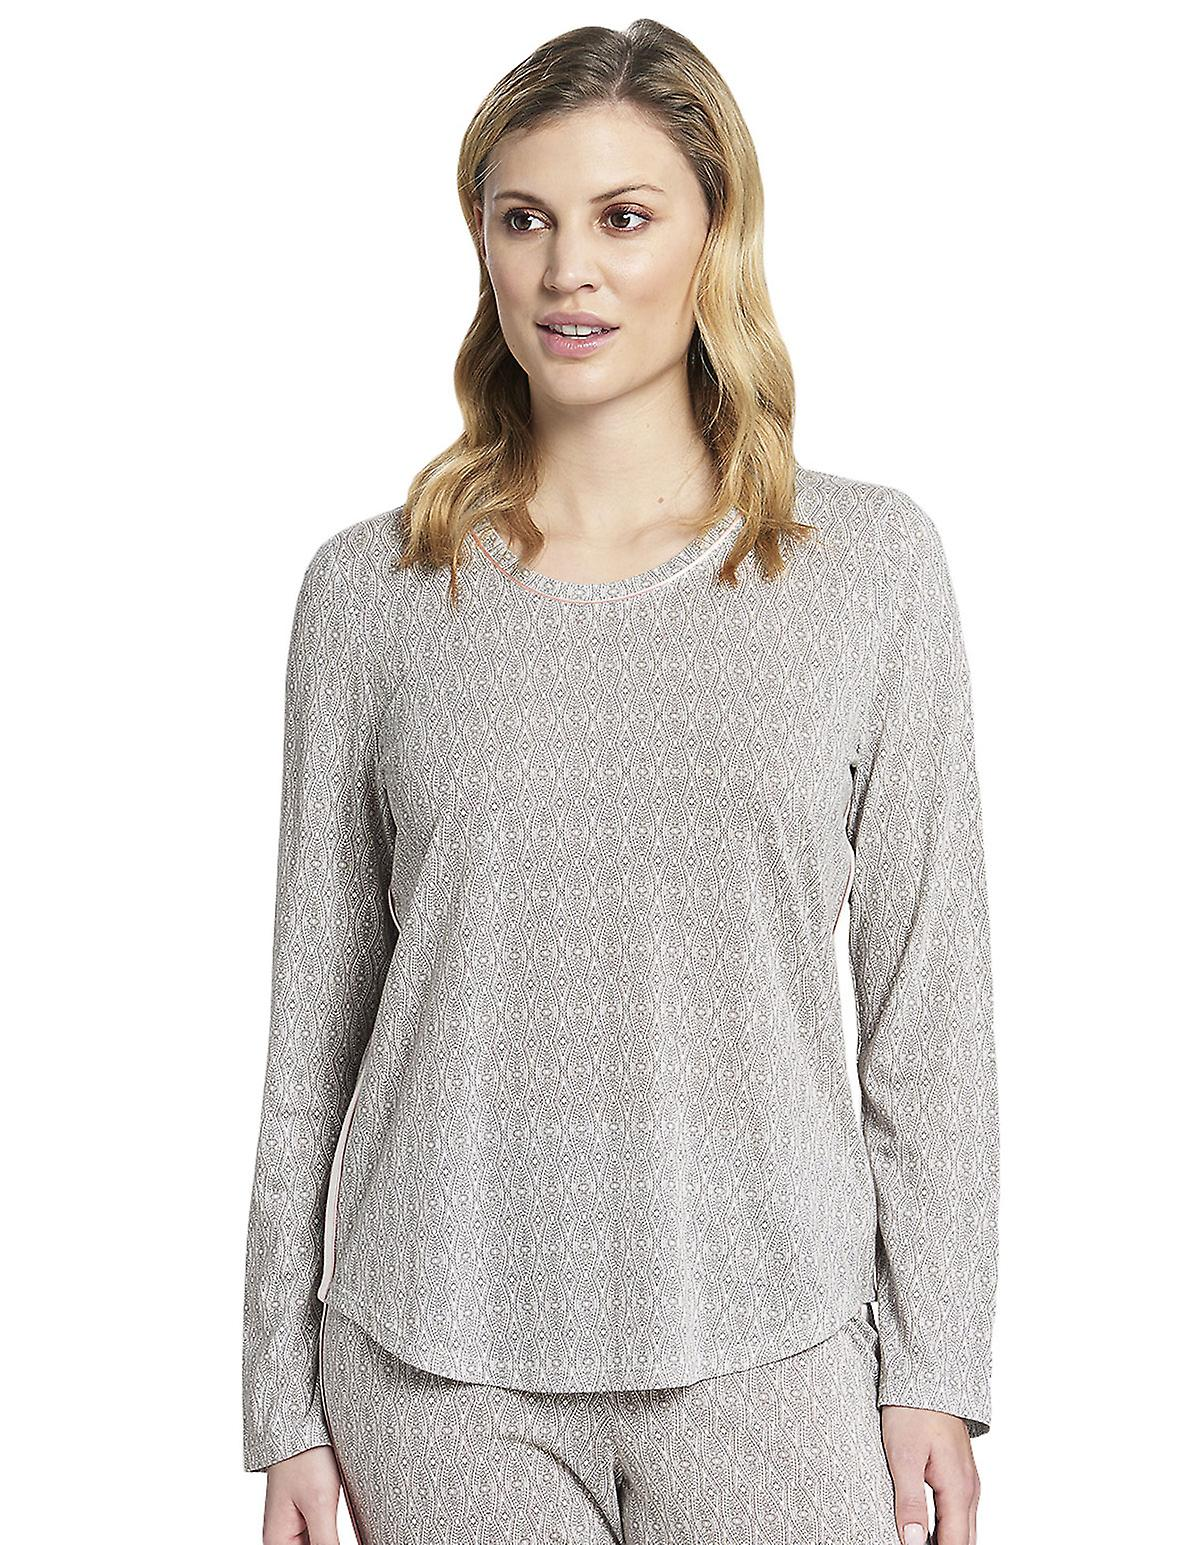 Rosch 1193704-16416 Women's Pure Off-White Oriental Flair Cotton Pyjama Top